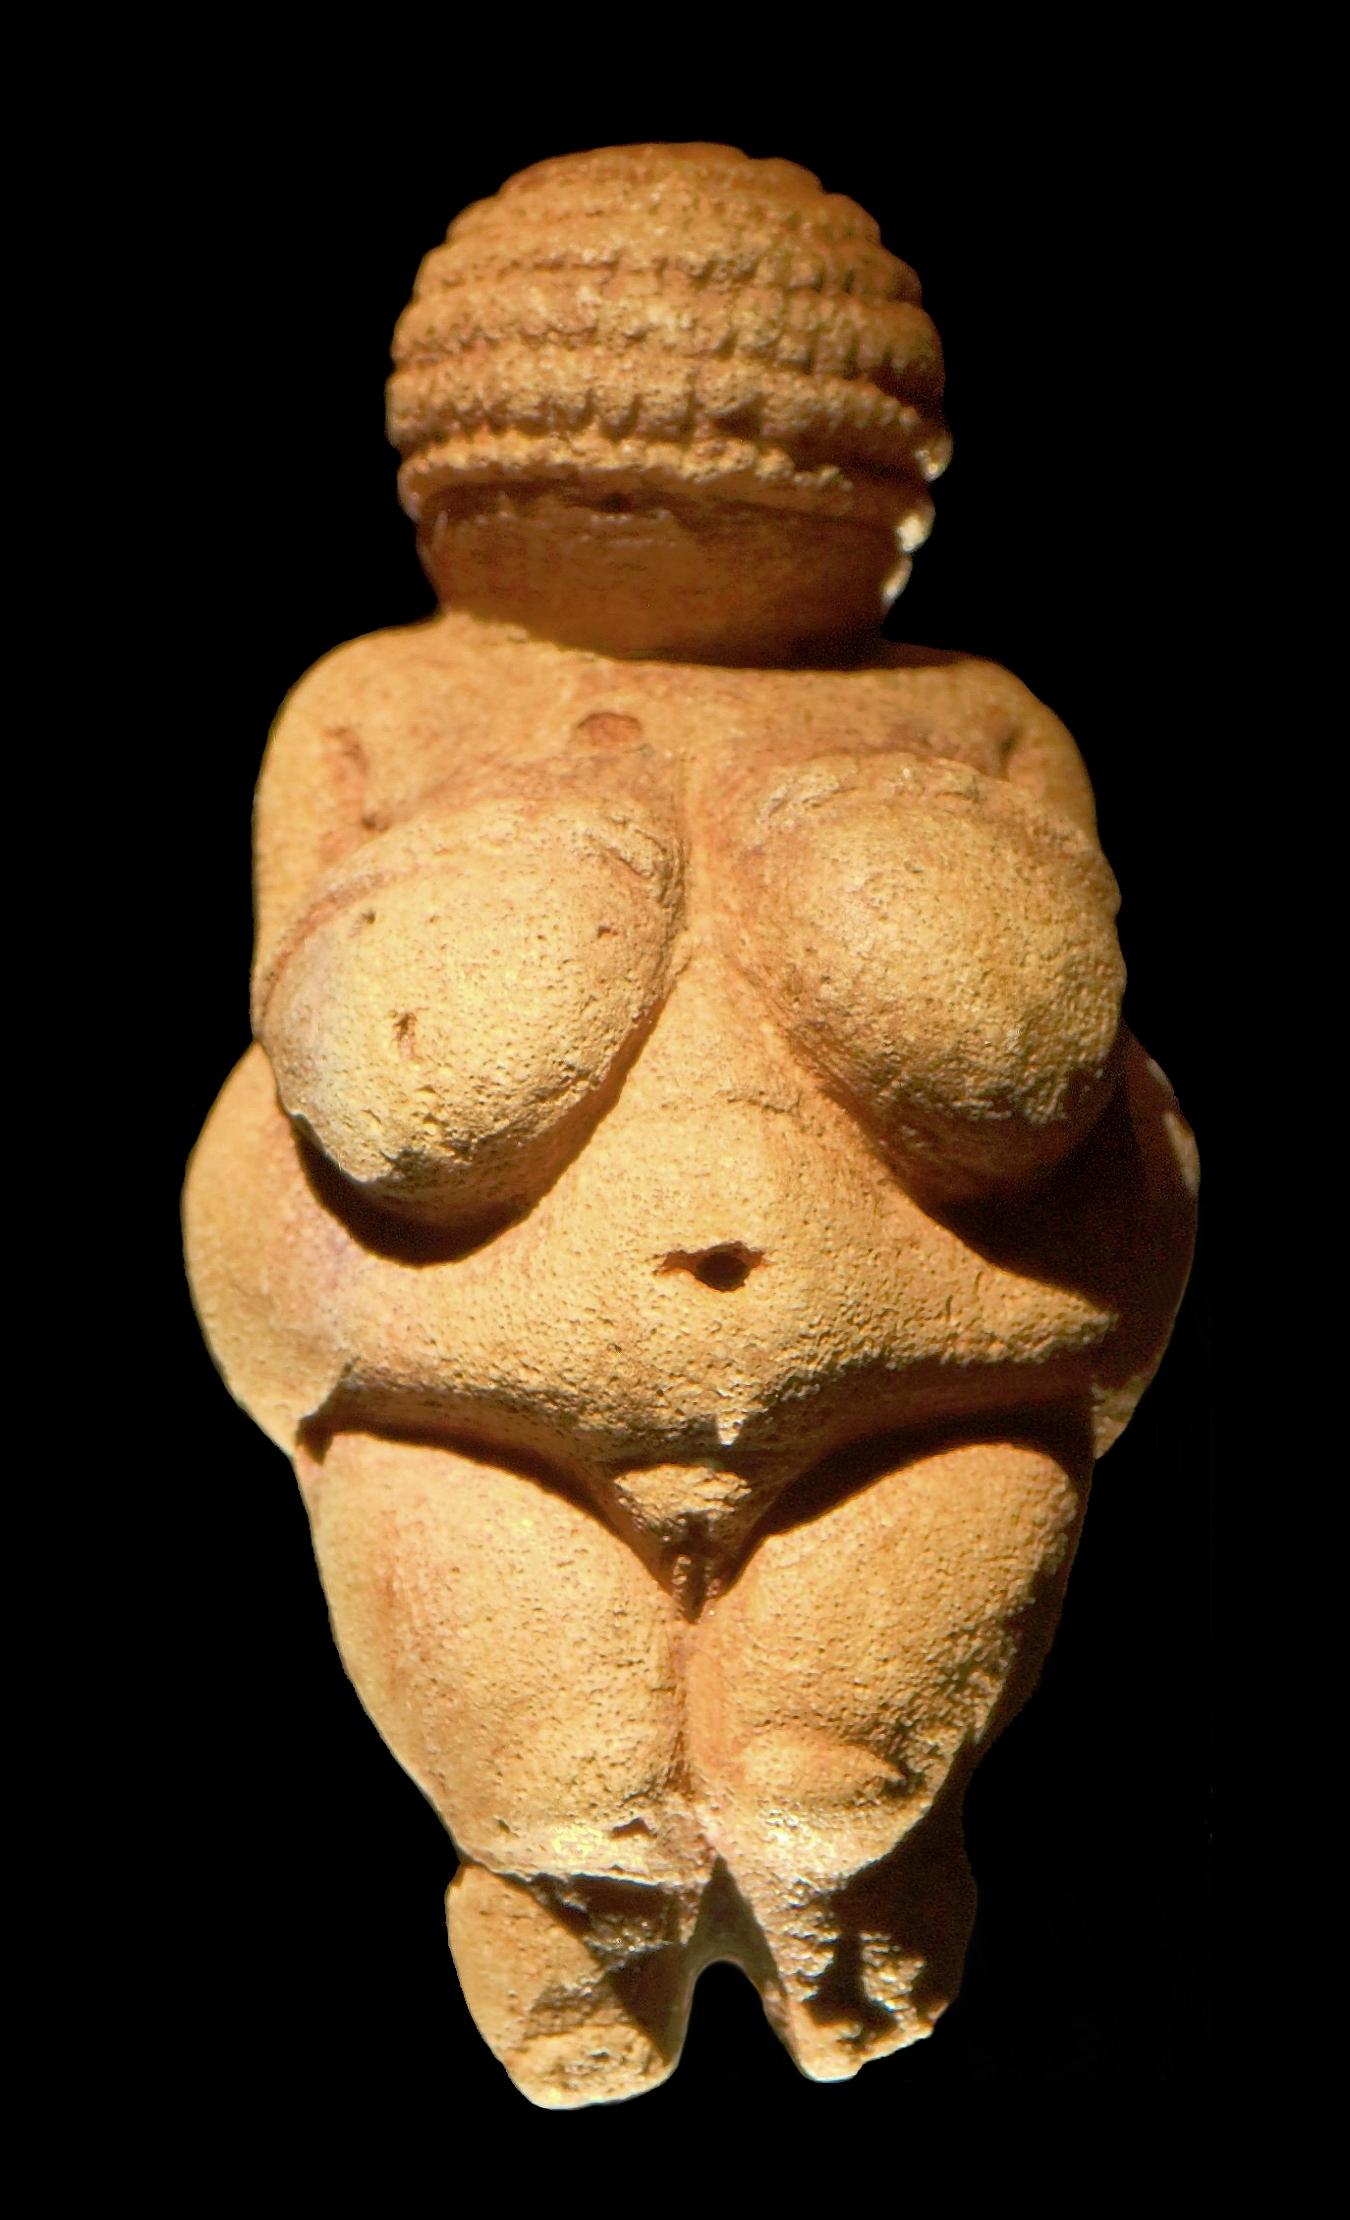 La Biblia - Página 3 Venus_of_Willendorf_frontview_retouched_2